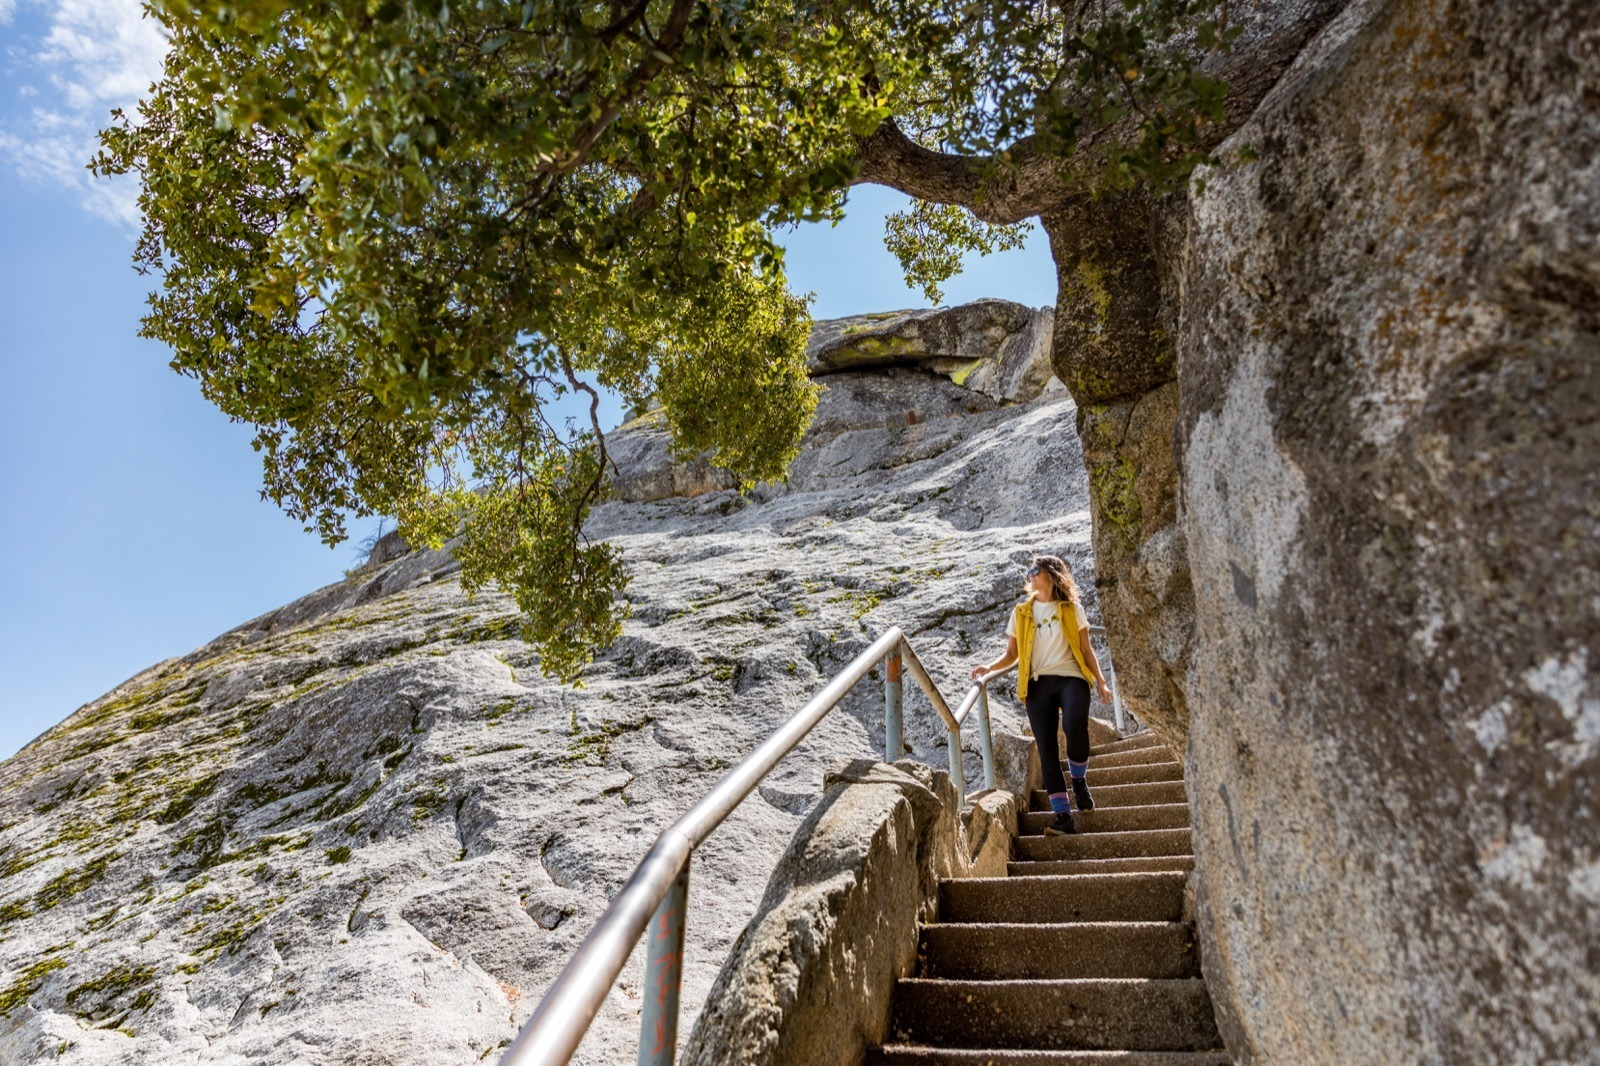 california-road-trip-high-sierra-visalia-moro-rock-hike-sequoia-national-park-4